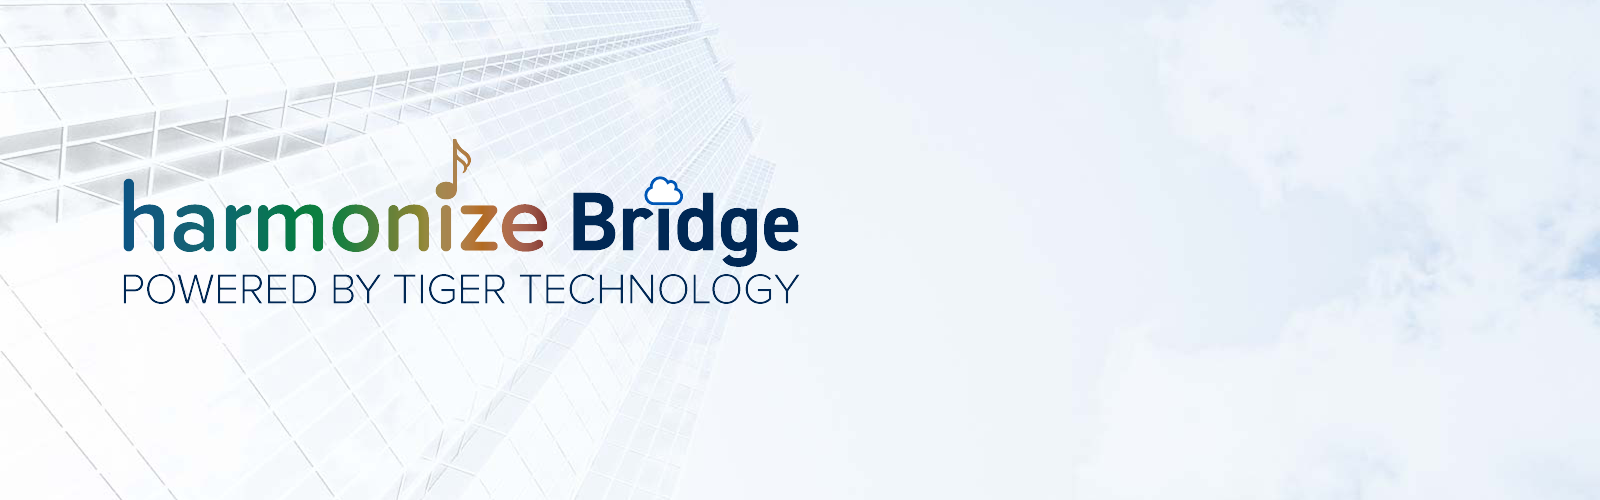 Harmonize Bridge powered by Tiger Technology